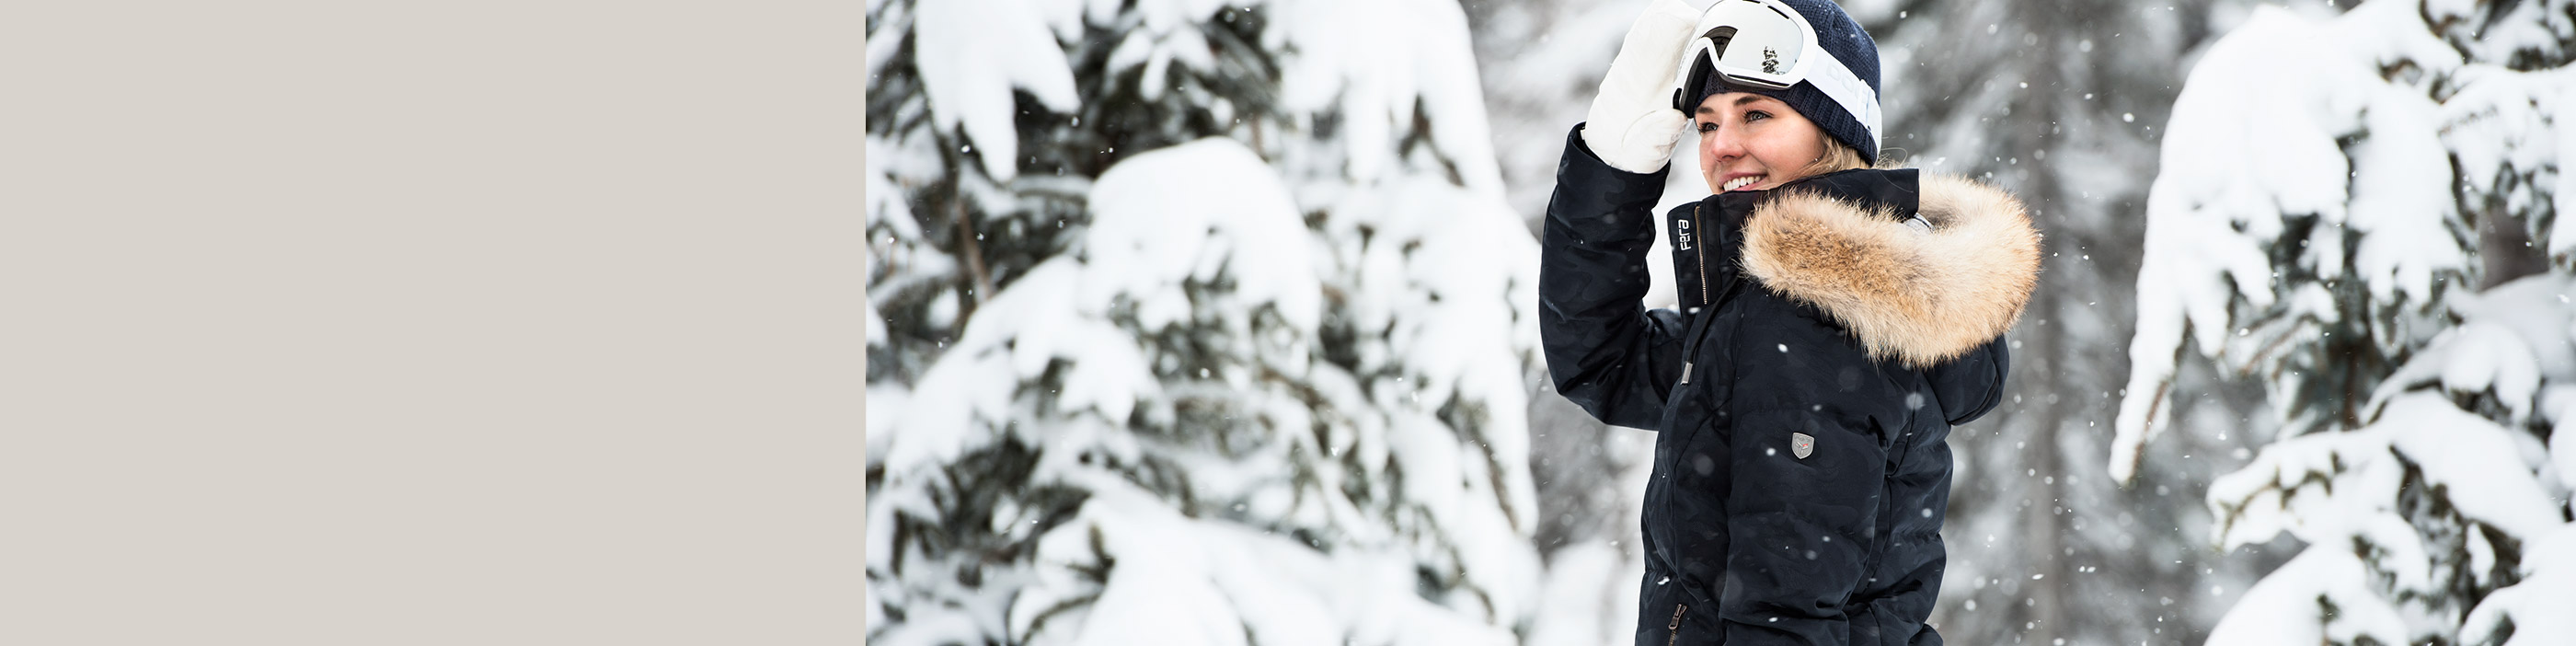 Ski Collection - Women s Designer Ski Clothes 8a443246dc